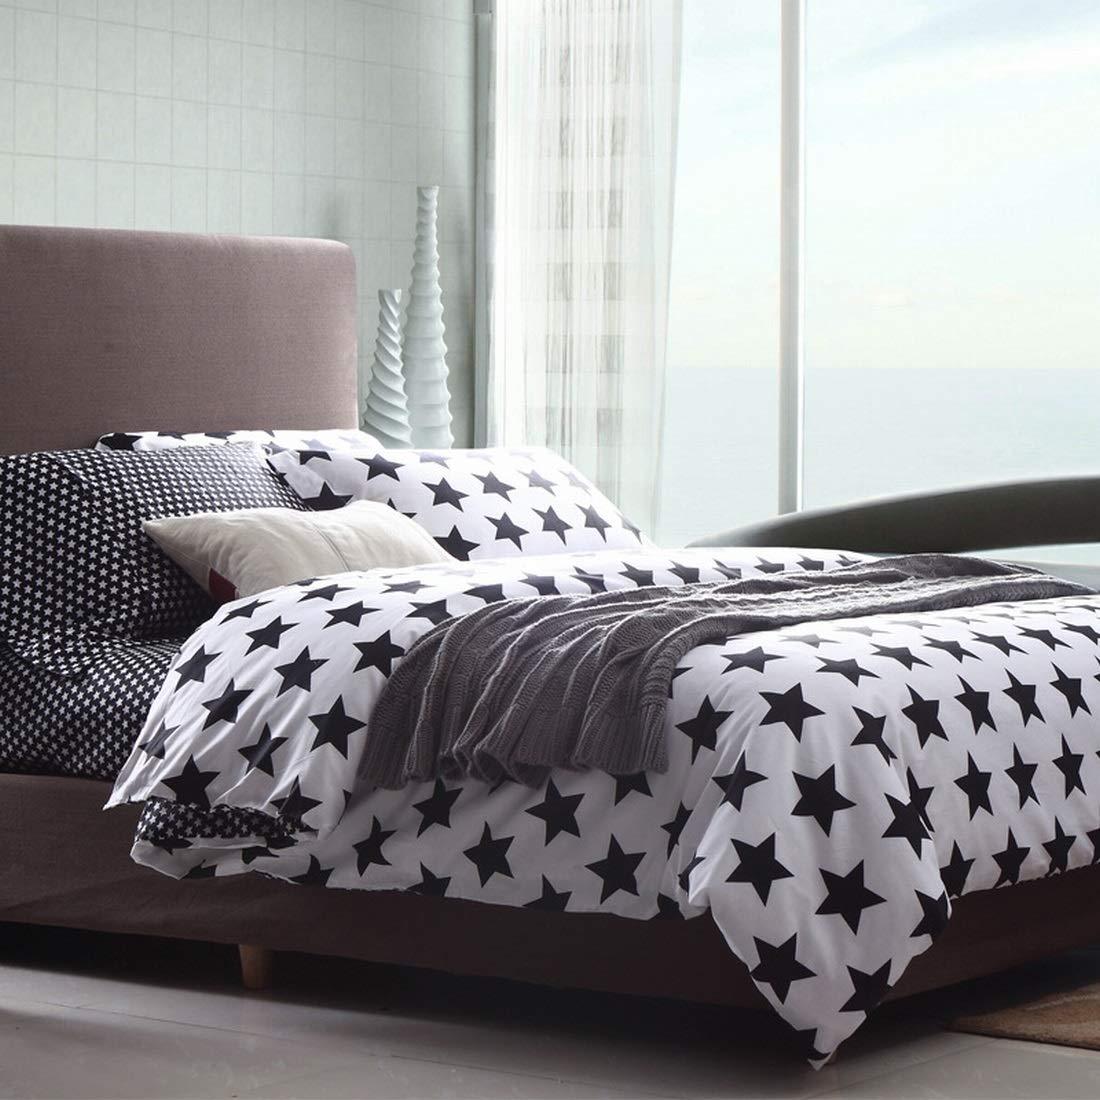 Koloeplf シンプルなコットン3D反応性プリントピュアコットン寝具4セット (PATTERN : Black White Gum-1, Size : QUEEN) B07NZNGRK2  Queen